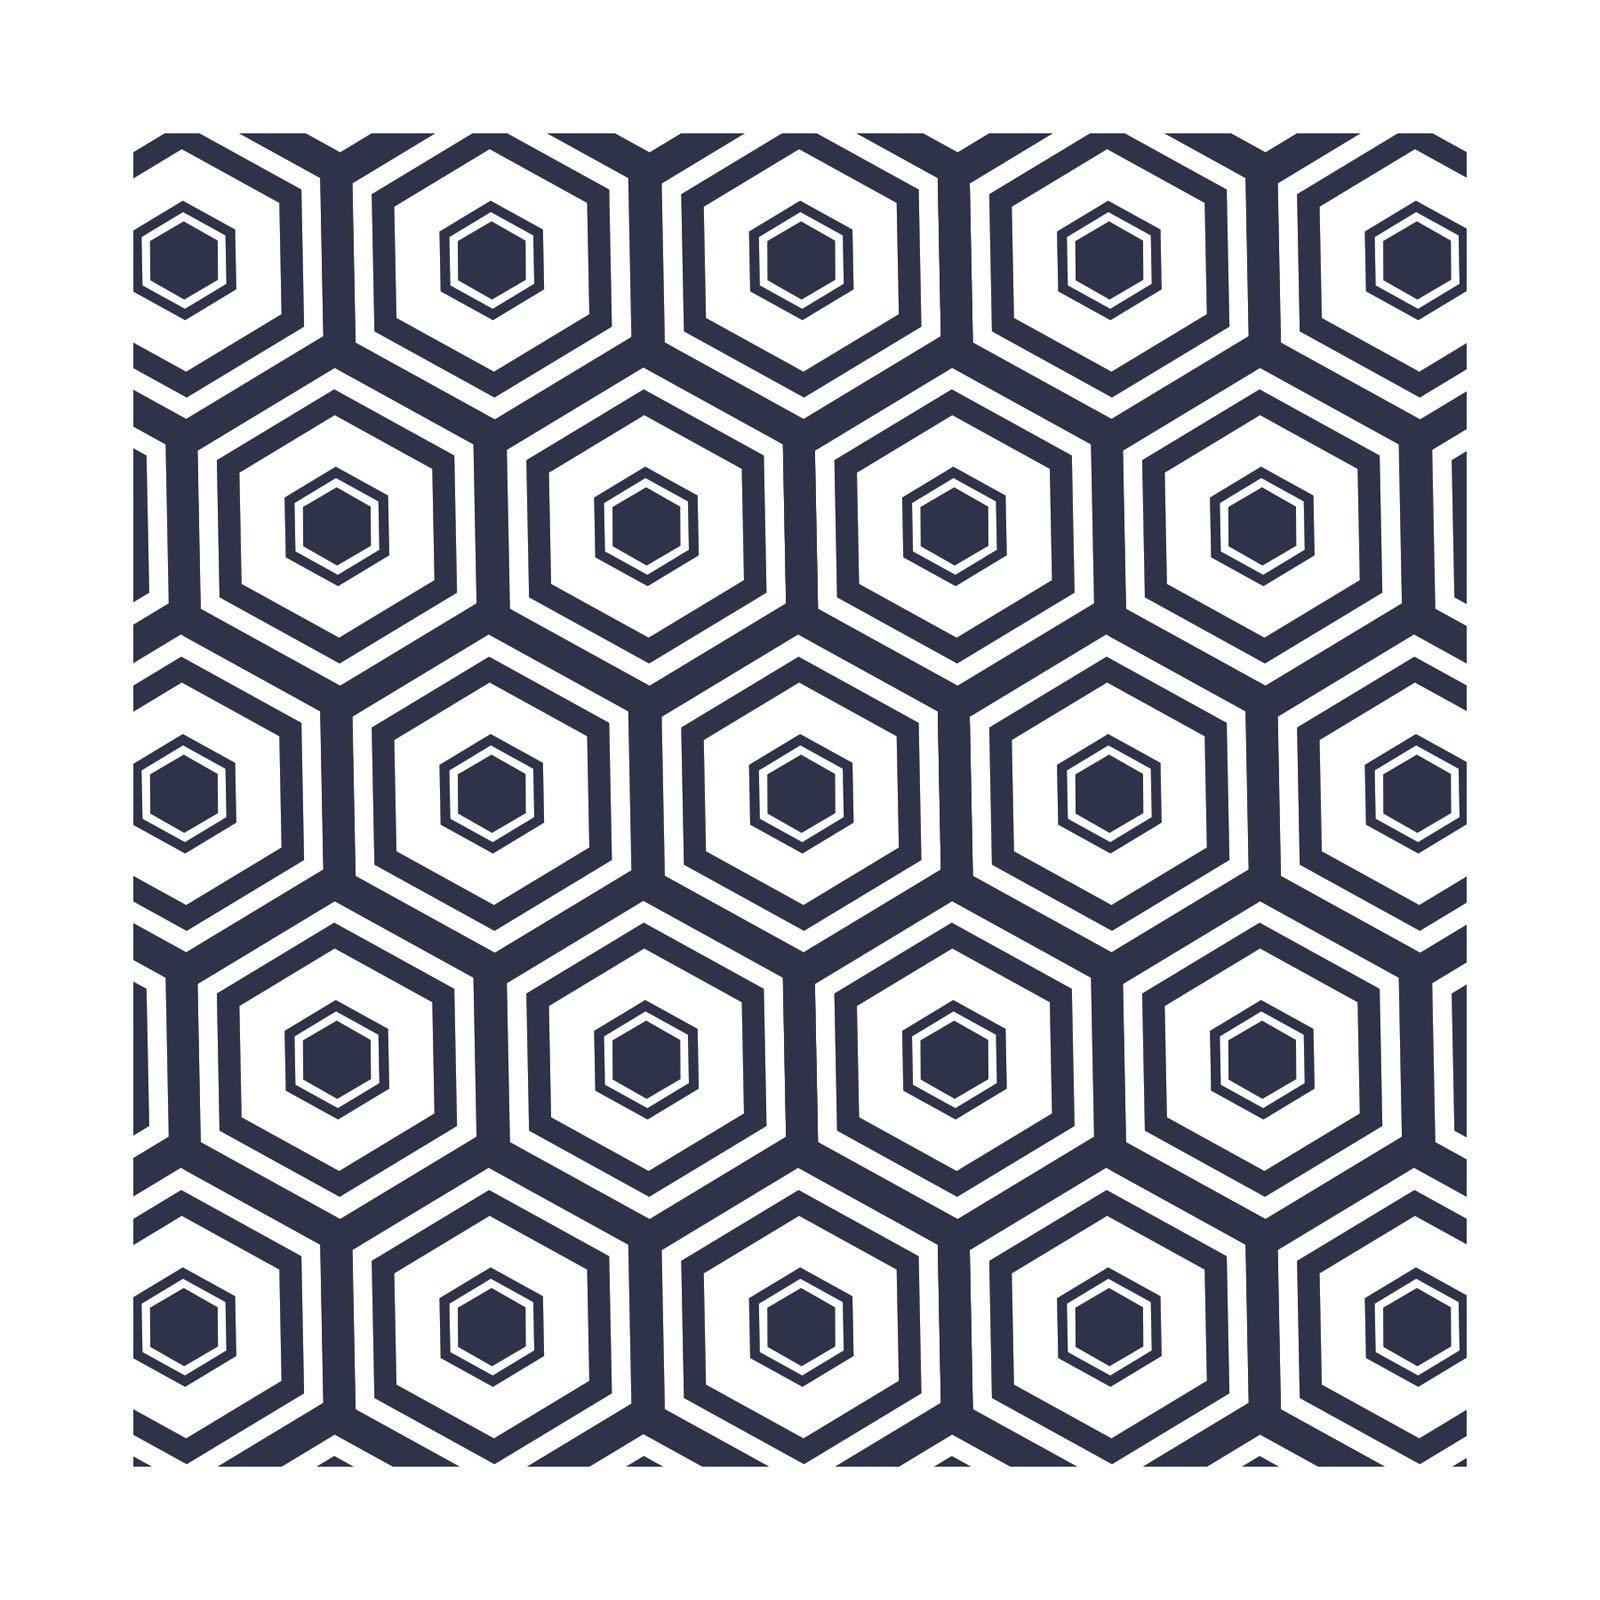 Camelot Fabrics Honeycomb Flannel 2150052B-01 Black `